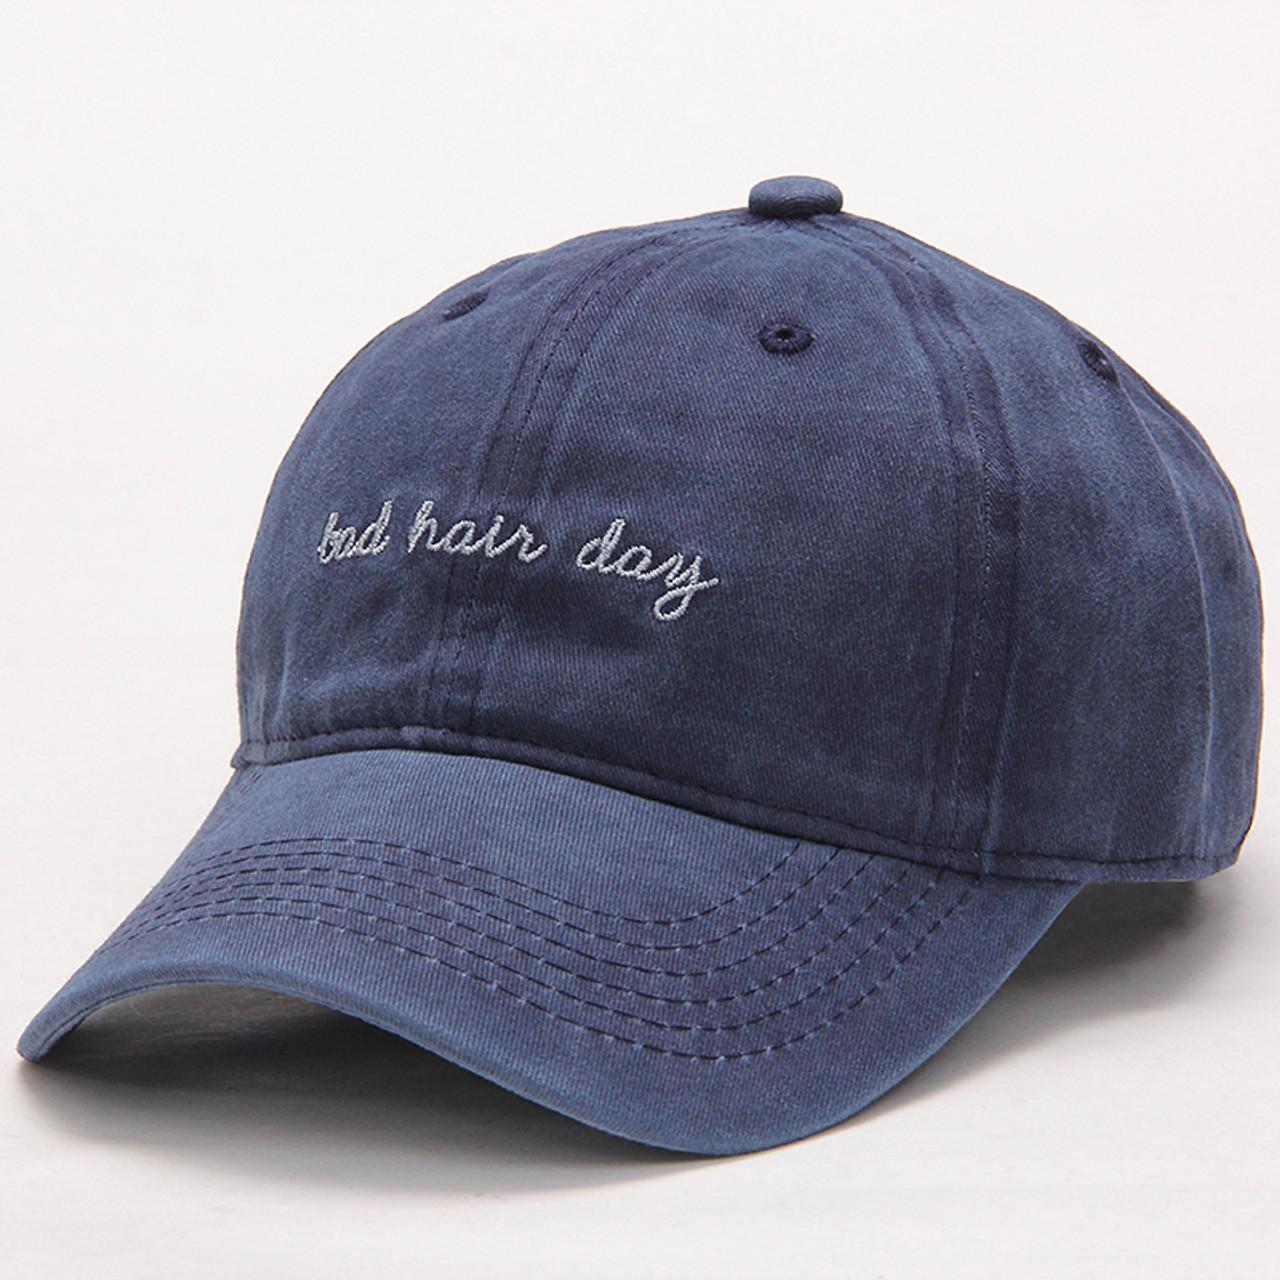 Men Mesh Plain Baseball Cap Solid Color Letter Pattern Hats Adjustable Unisex